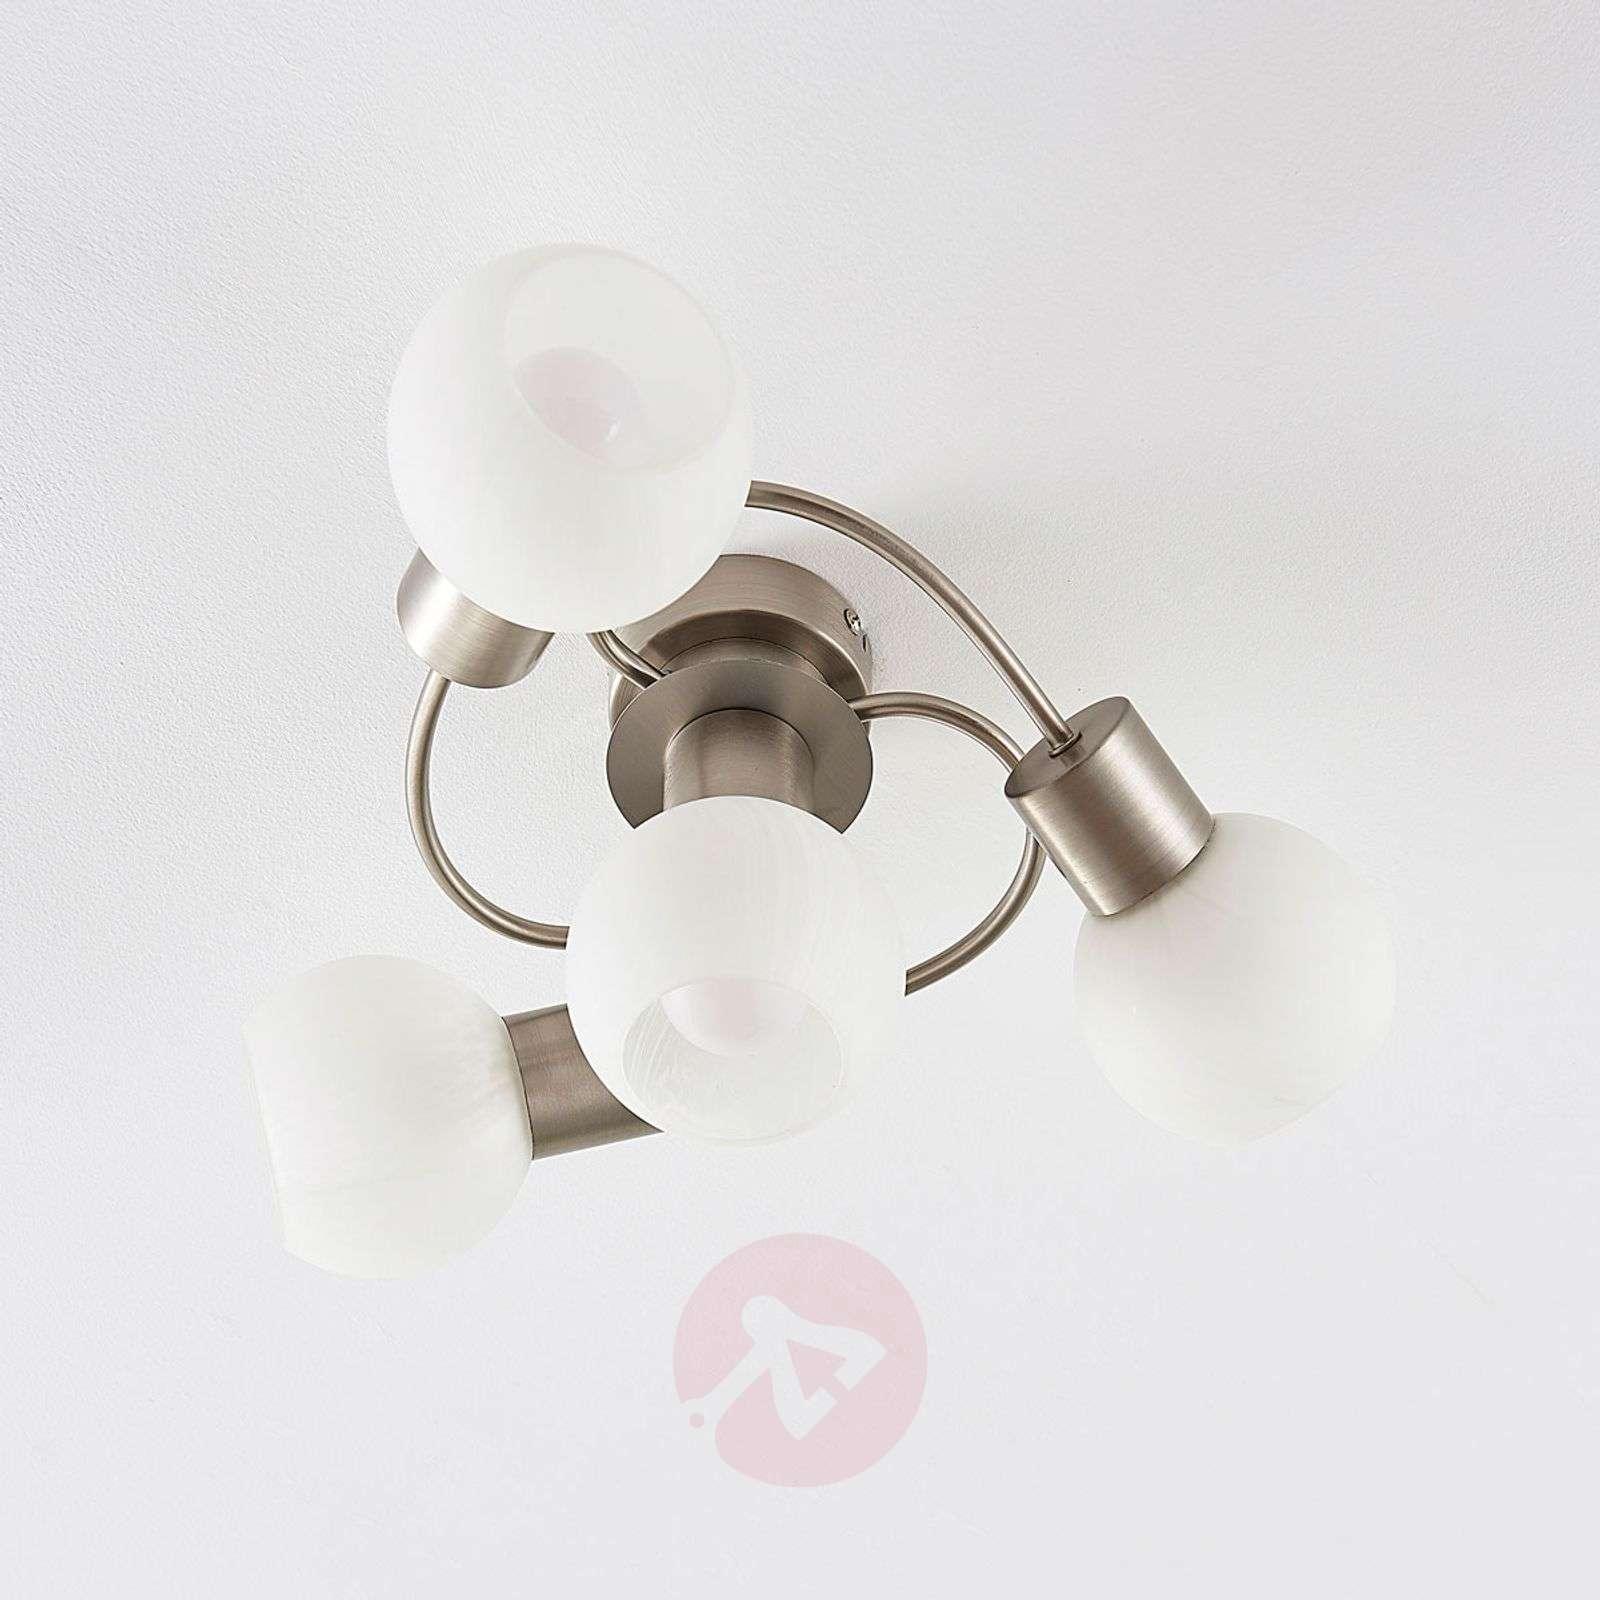 Easydim-LED-kattovalaisin Tanos, 4 valkoista lasia-9621571-02